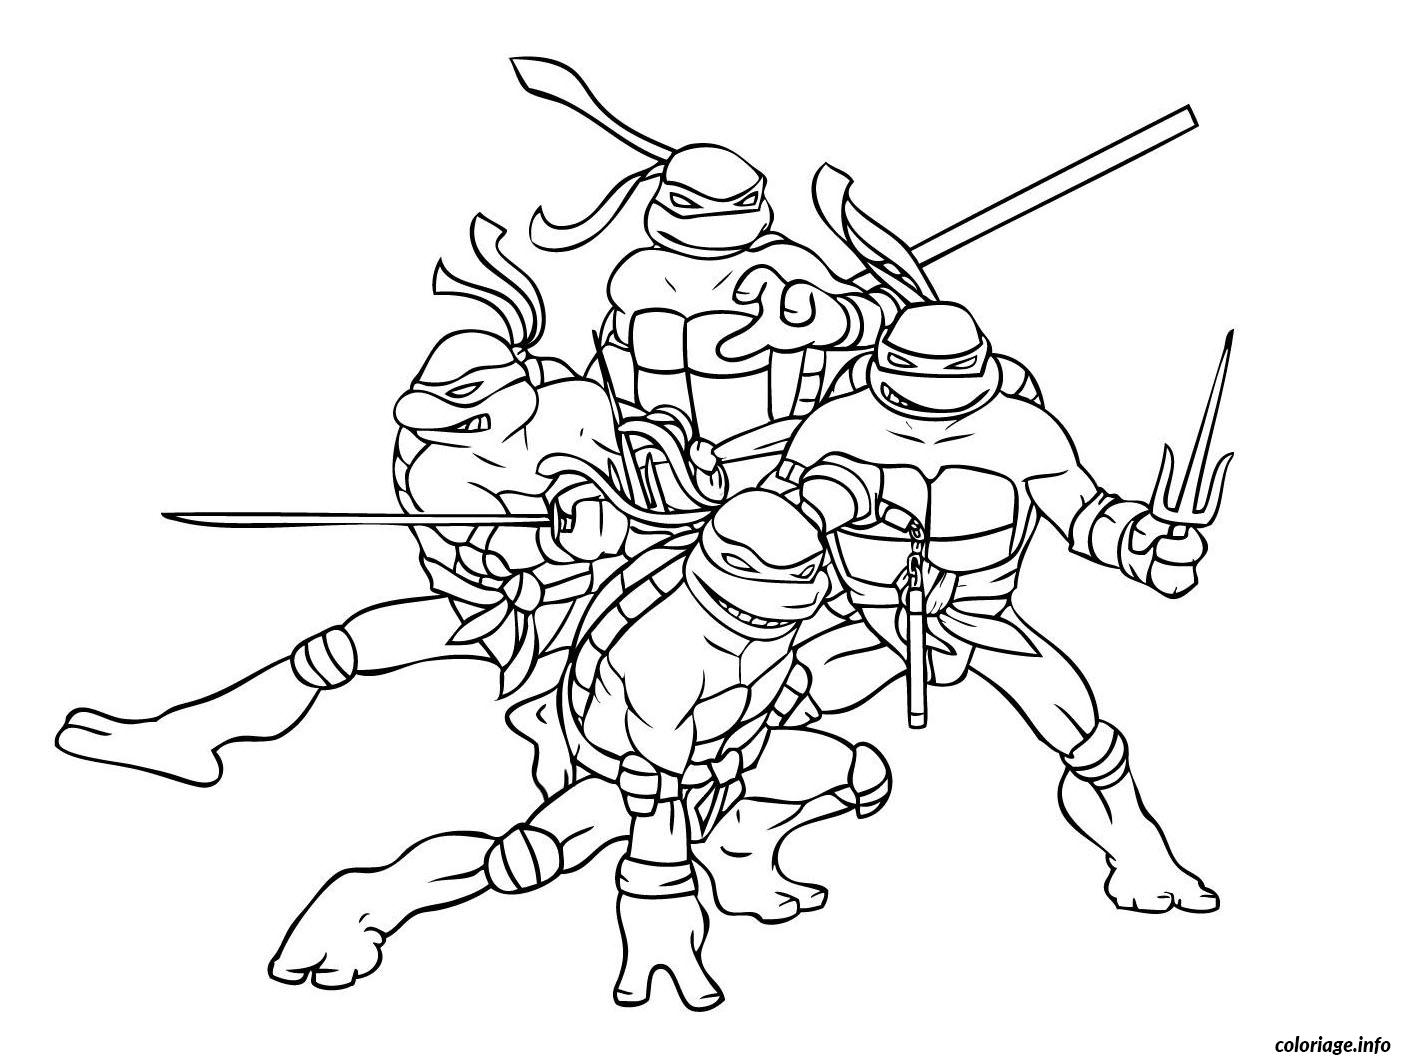 Coloriage tortue ninja 2 dessin - Dessin anime des tortues ninja ...